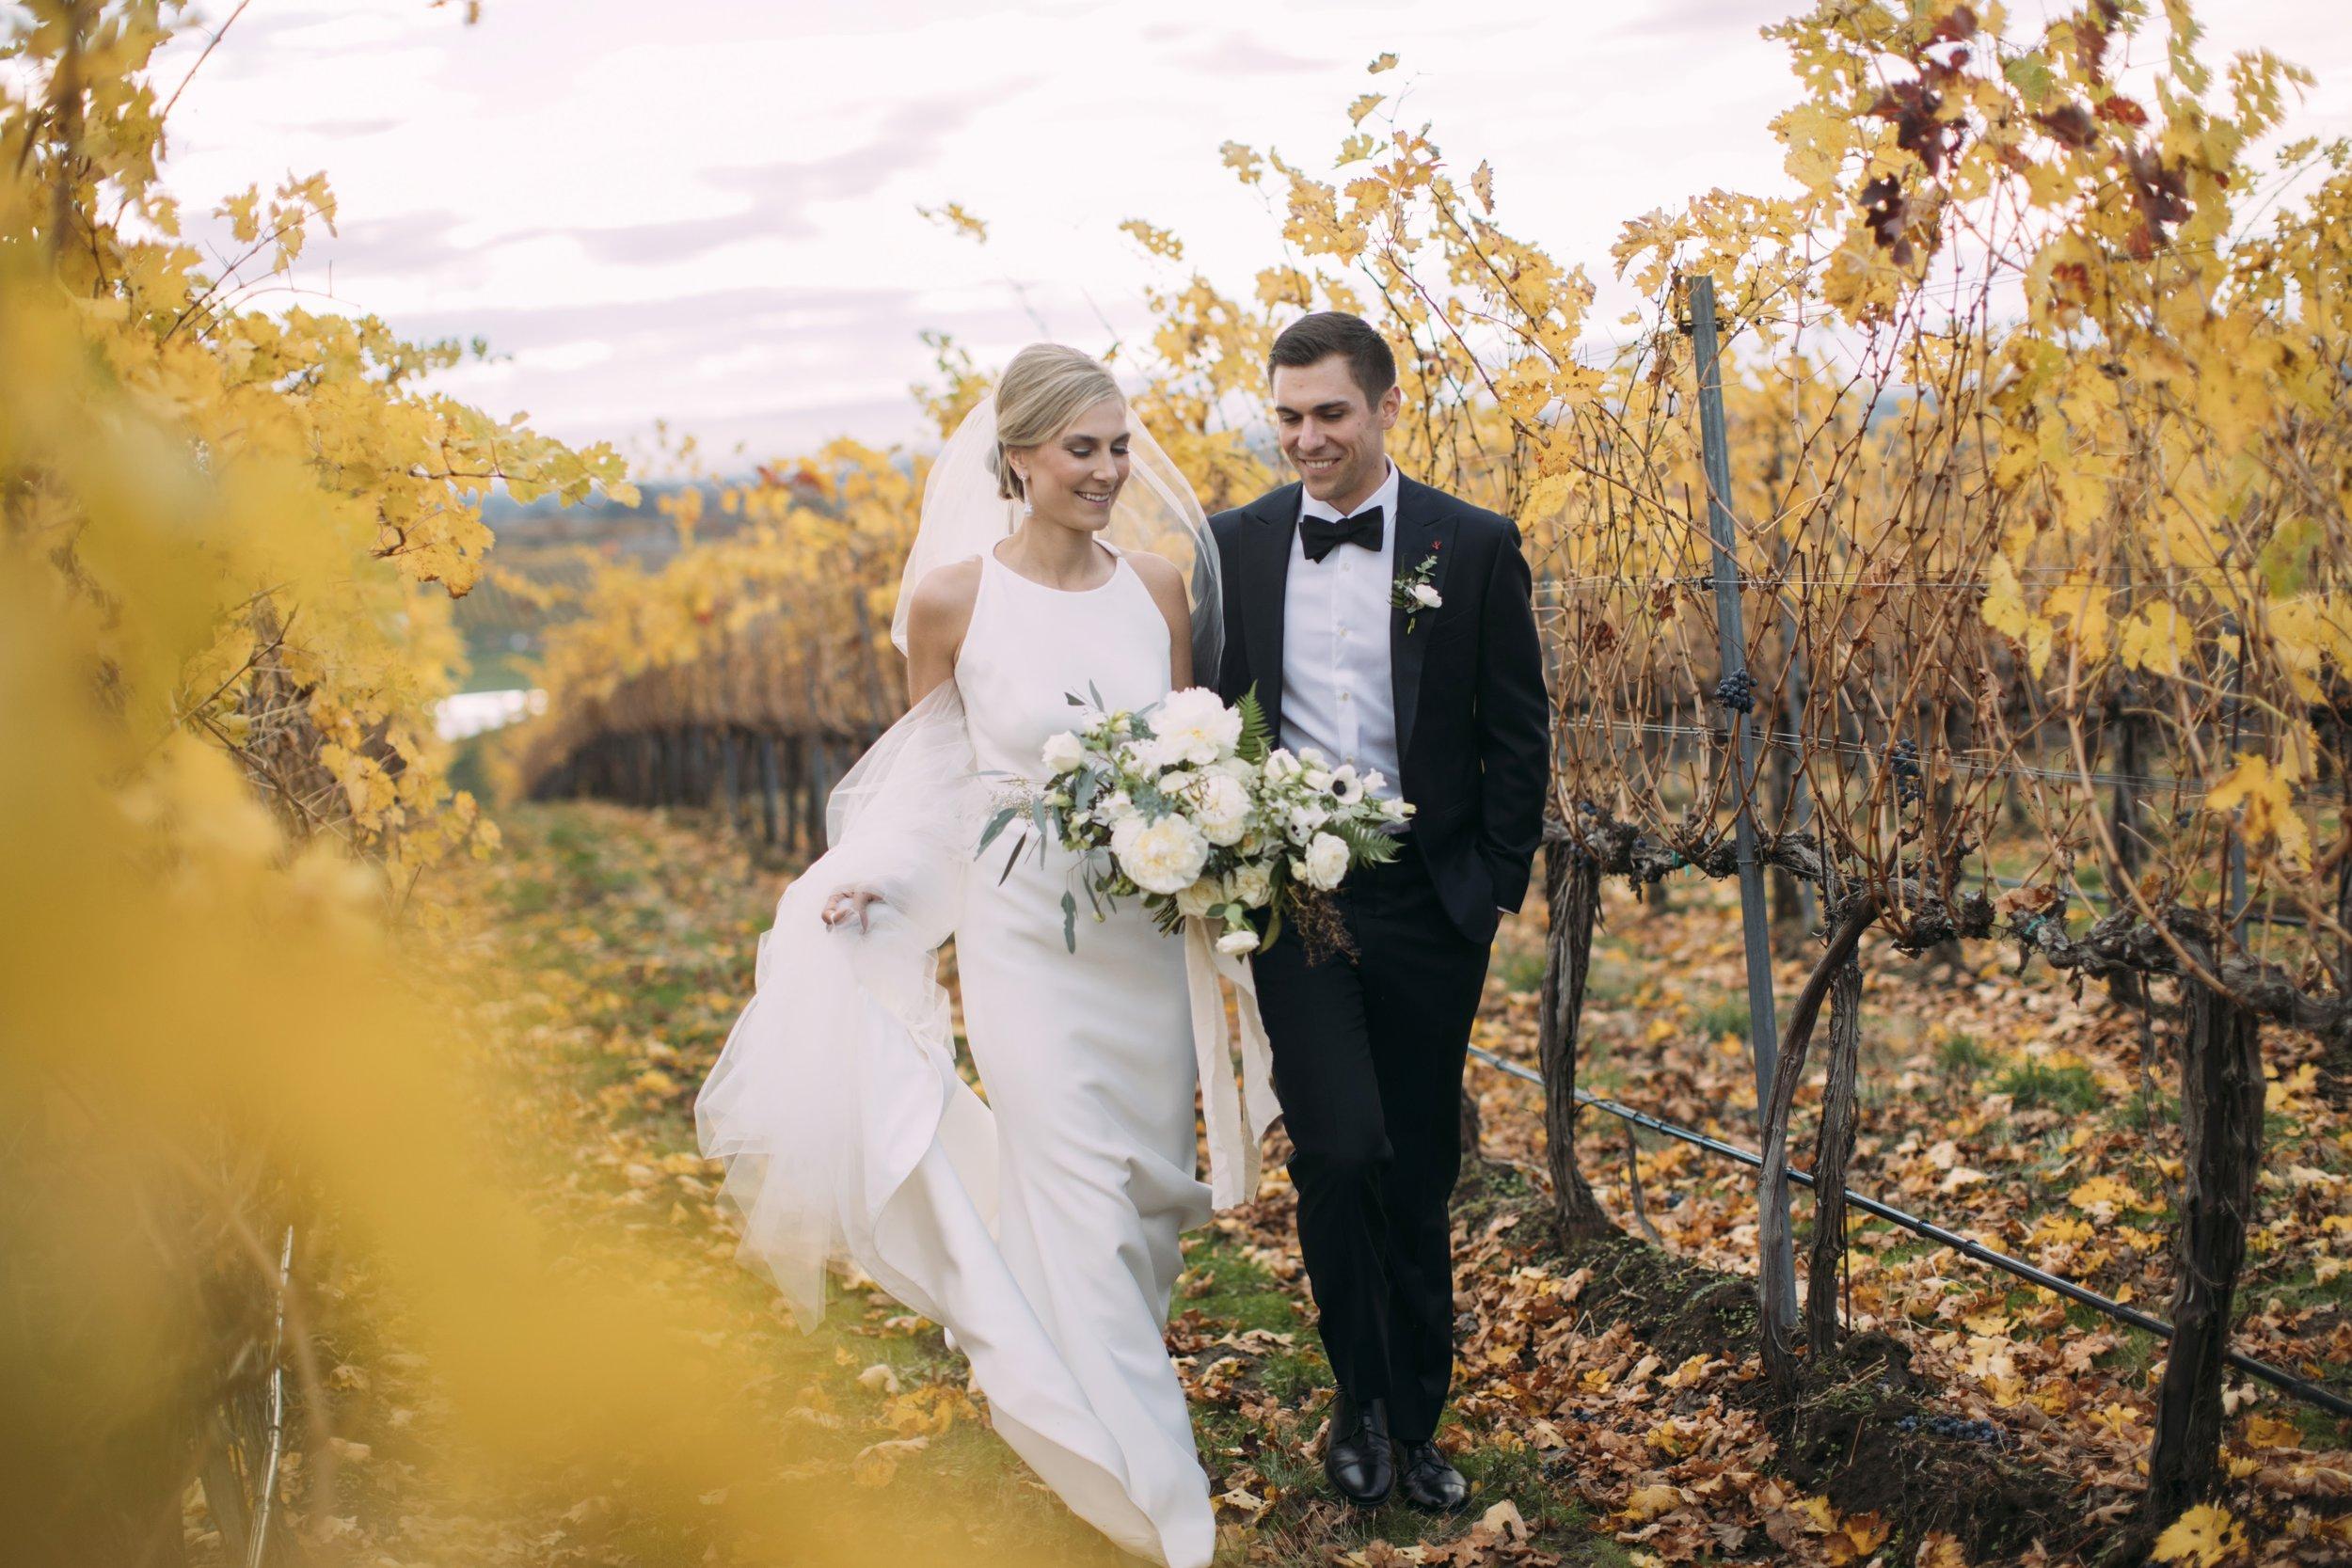 Portland_wedding_planner_walla_walla_01.jpg